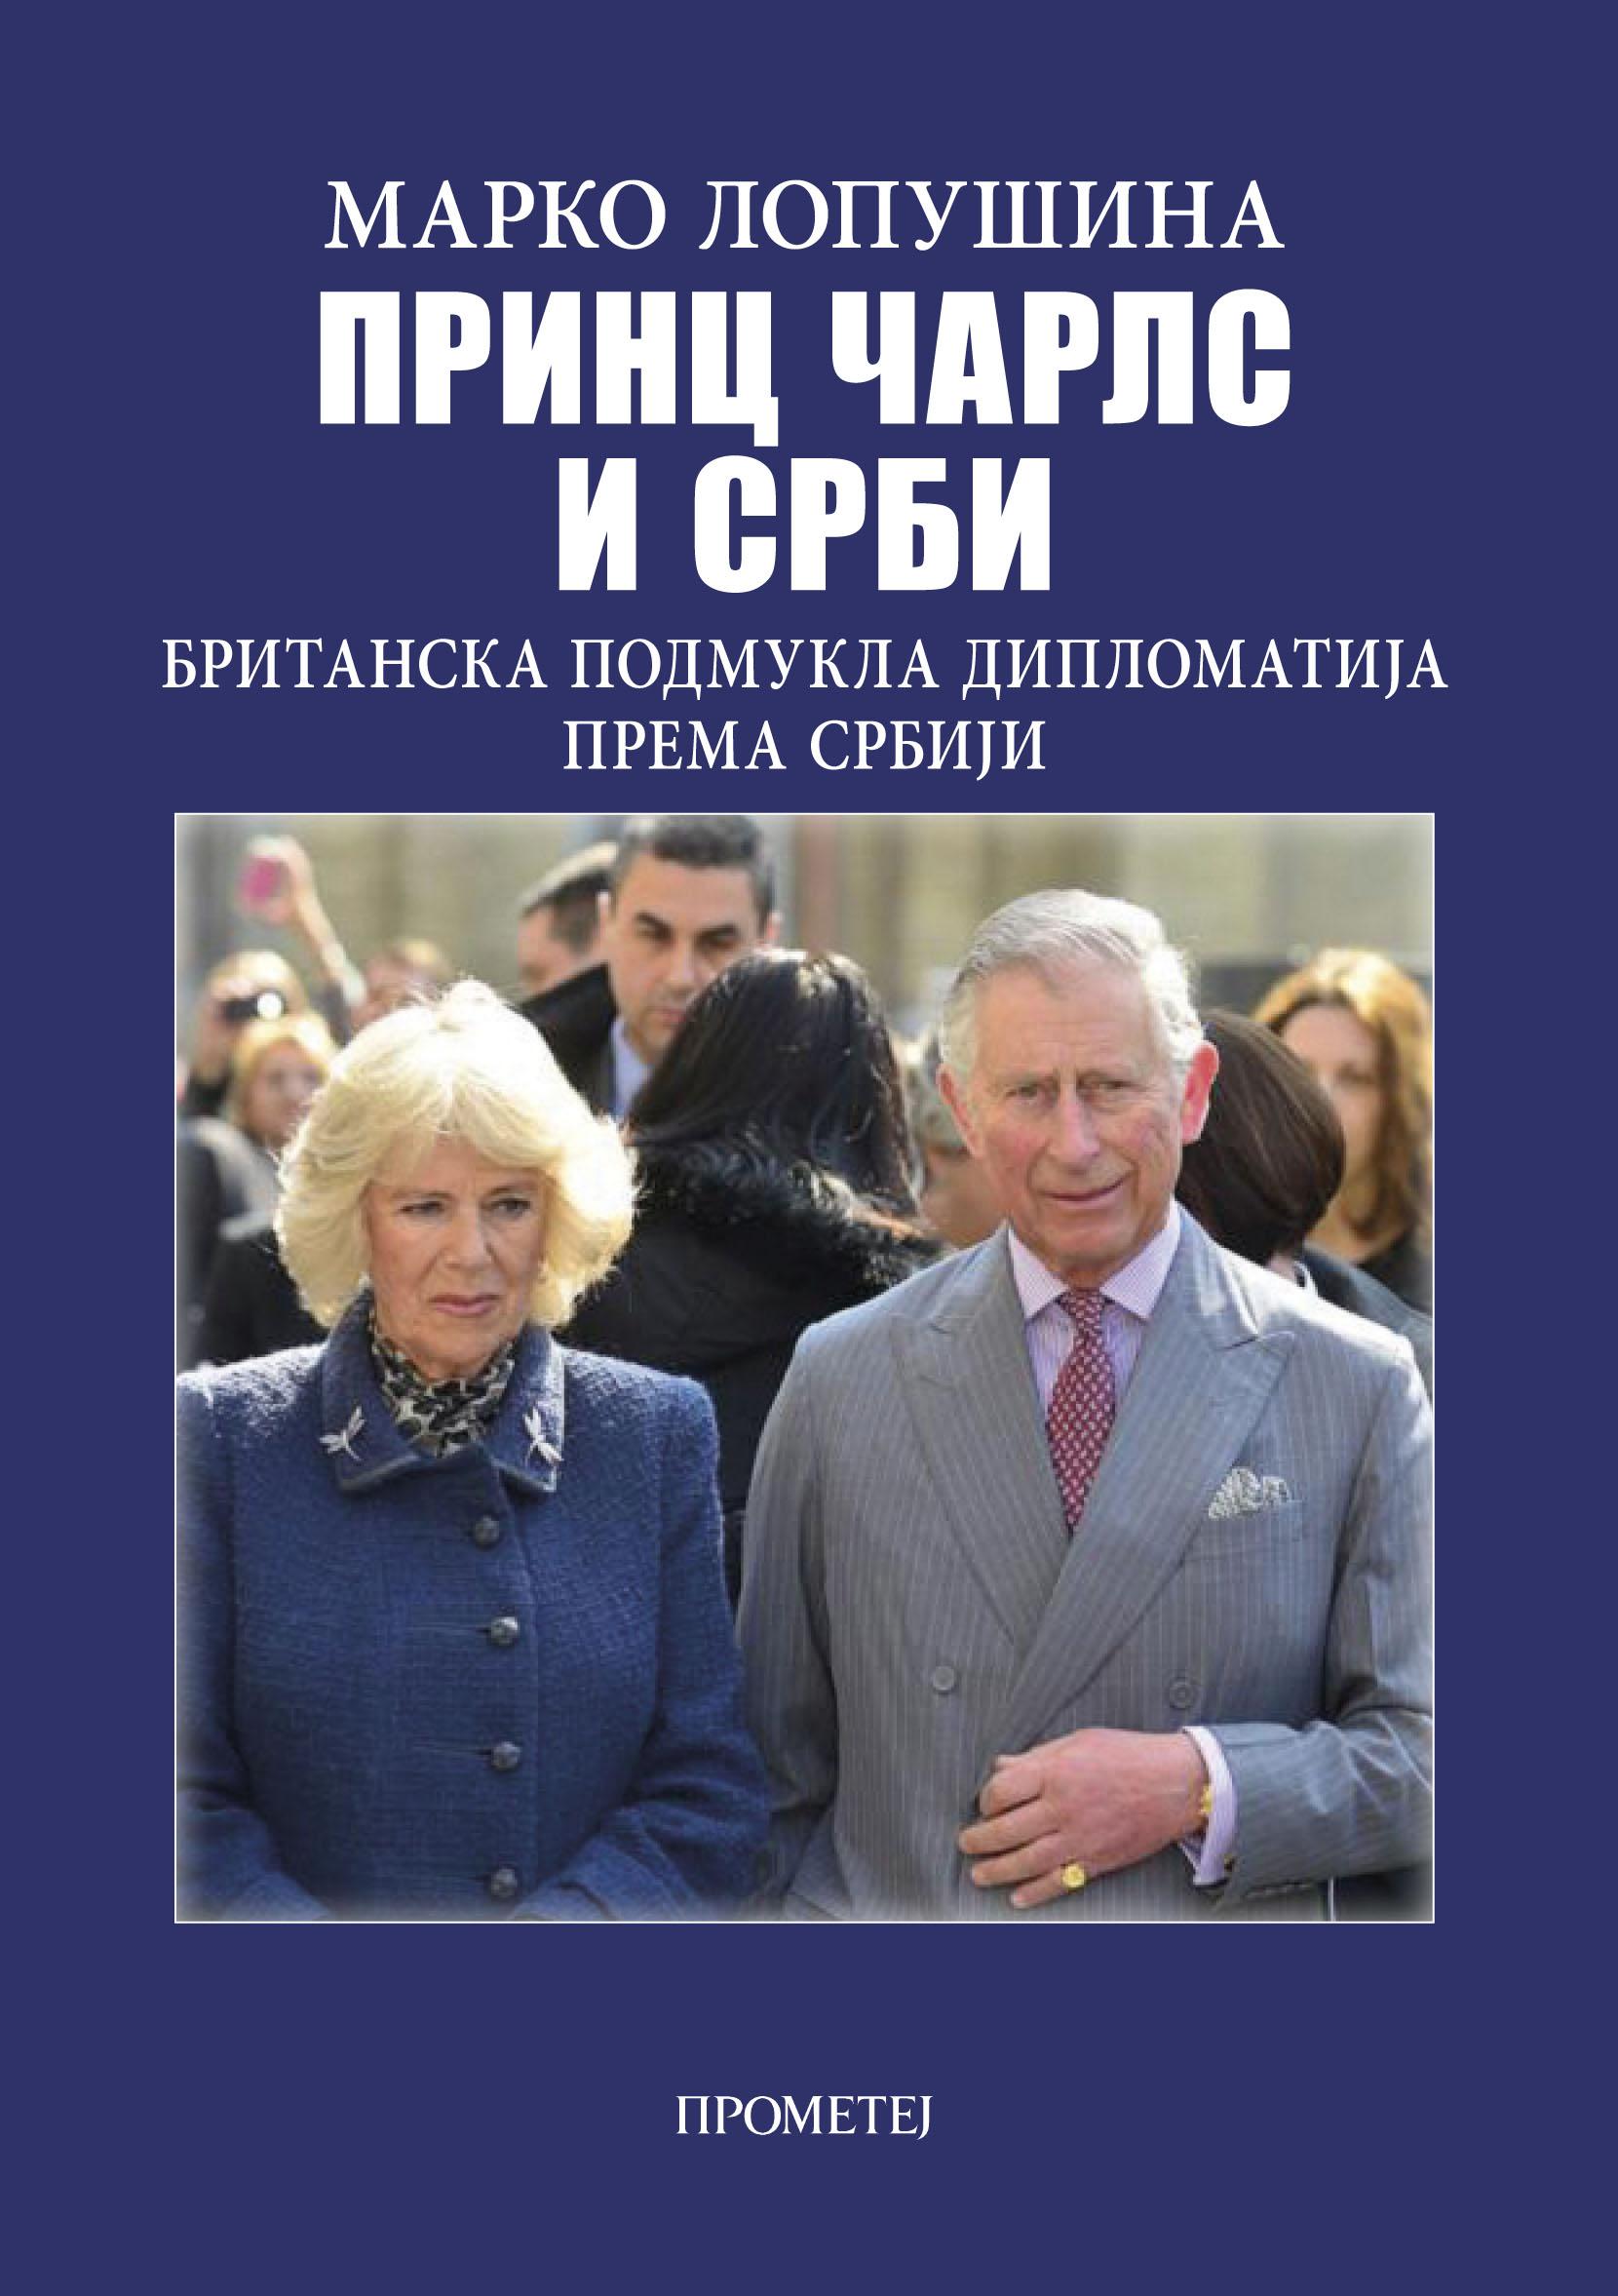 Принц Чарлс и Срби